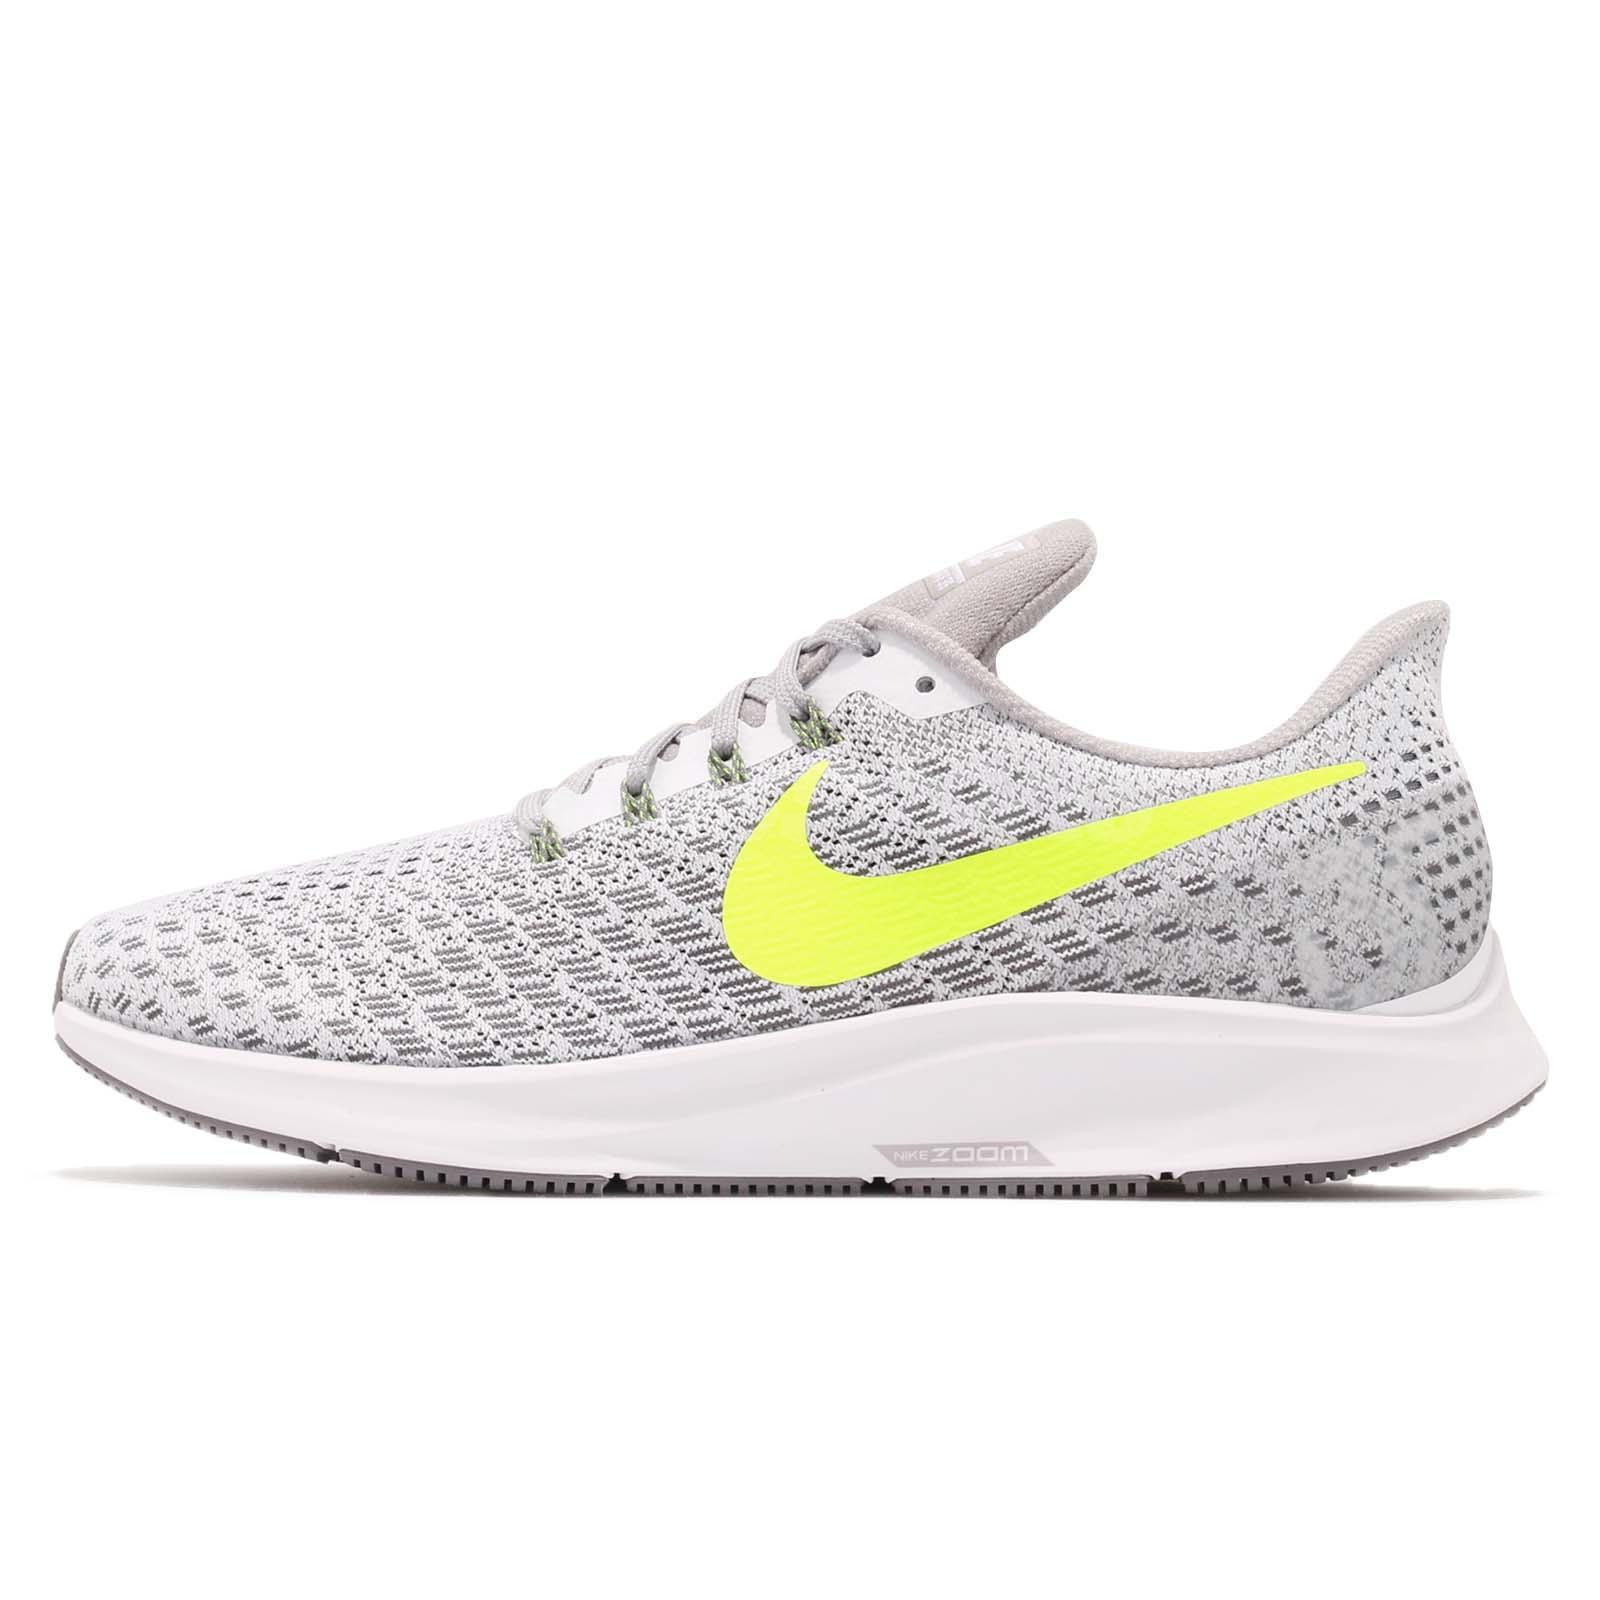 2c8d06258ee7 Nike Air Zoom Pegasus 35 White Volt Grey Men Running Shoes Sneakers 942851 -101